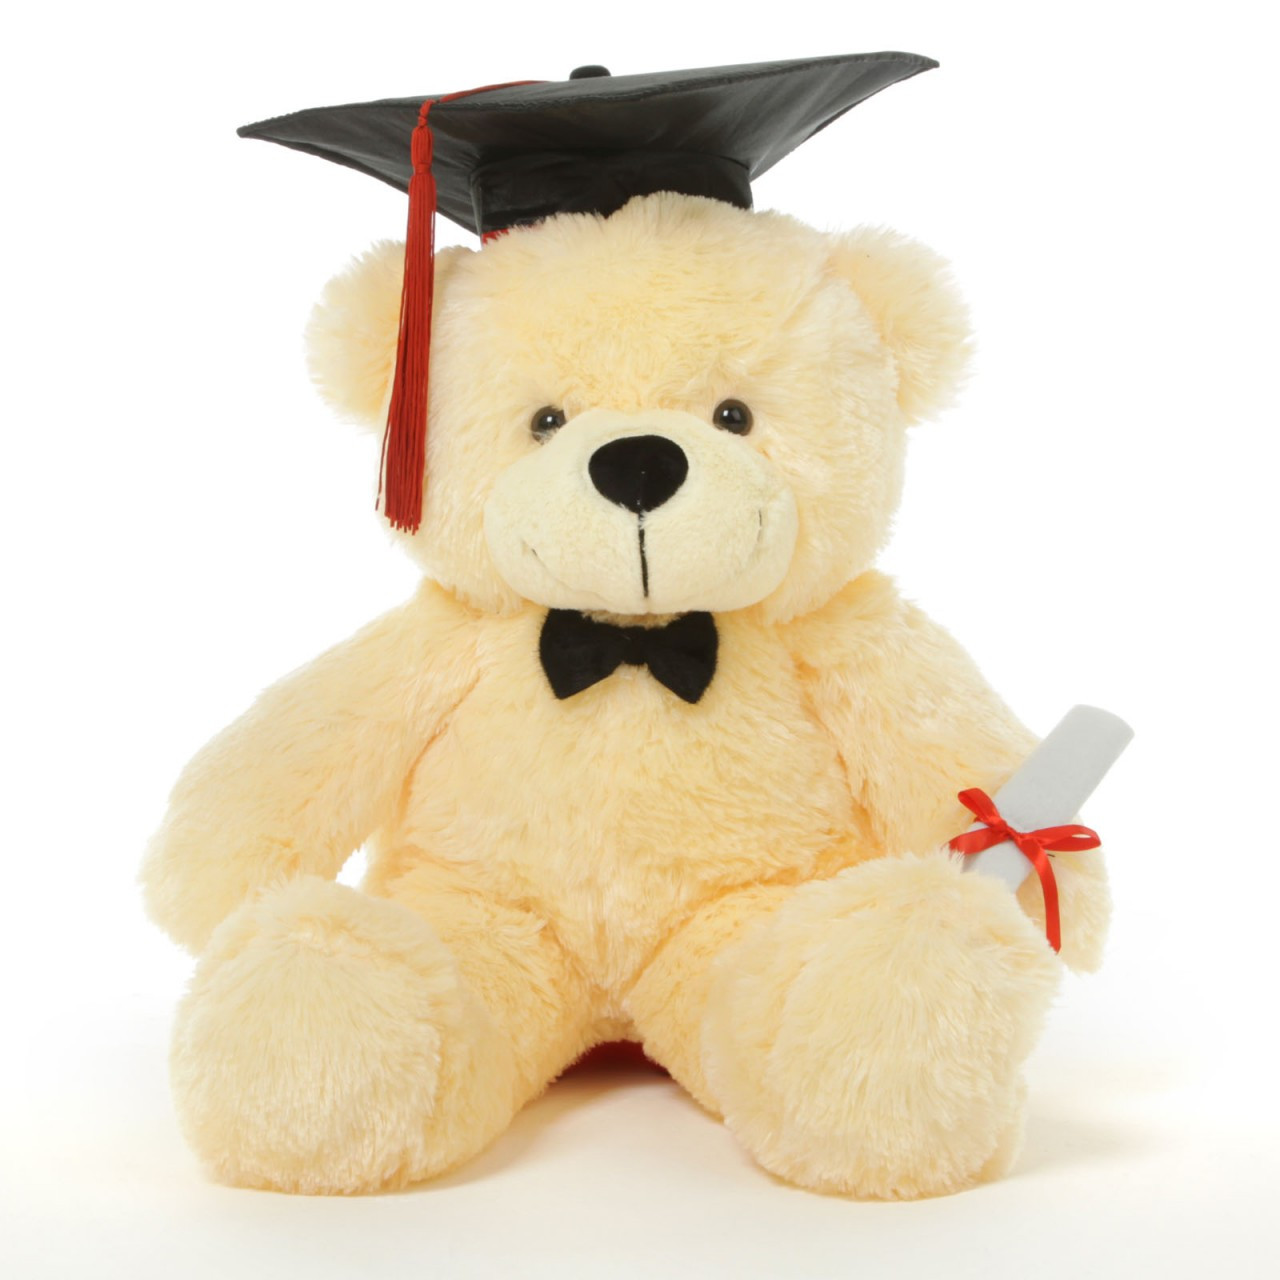 Cozy G Cuddles Vanilla Graduation Teddy Bear with Cap and Diploma 24in